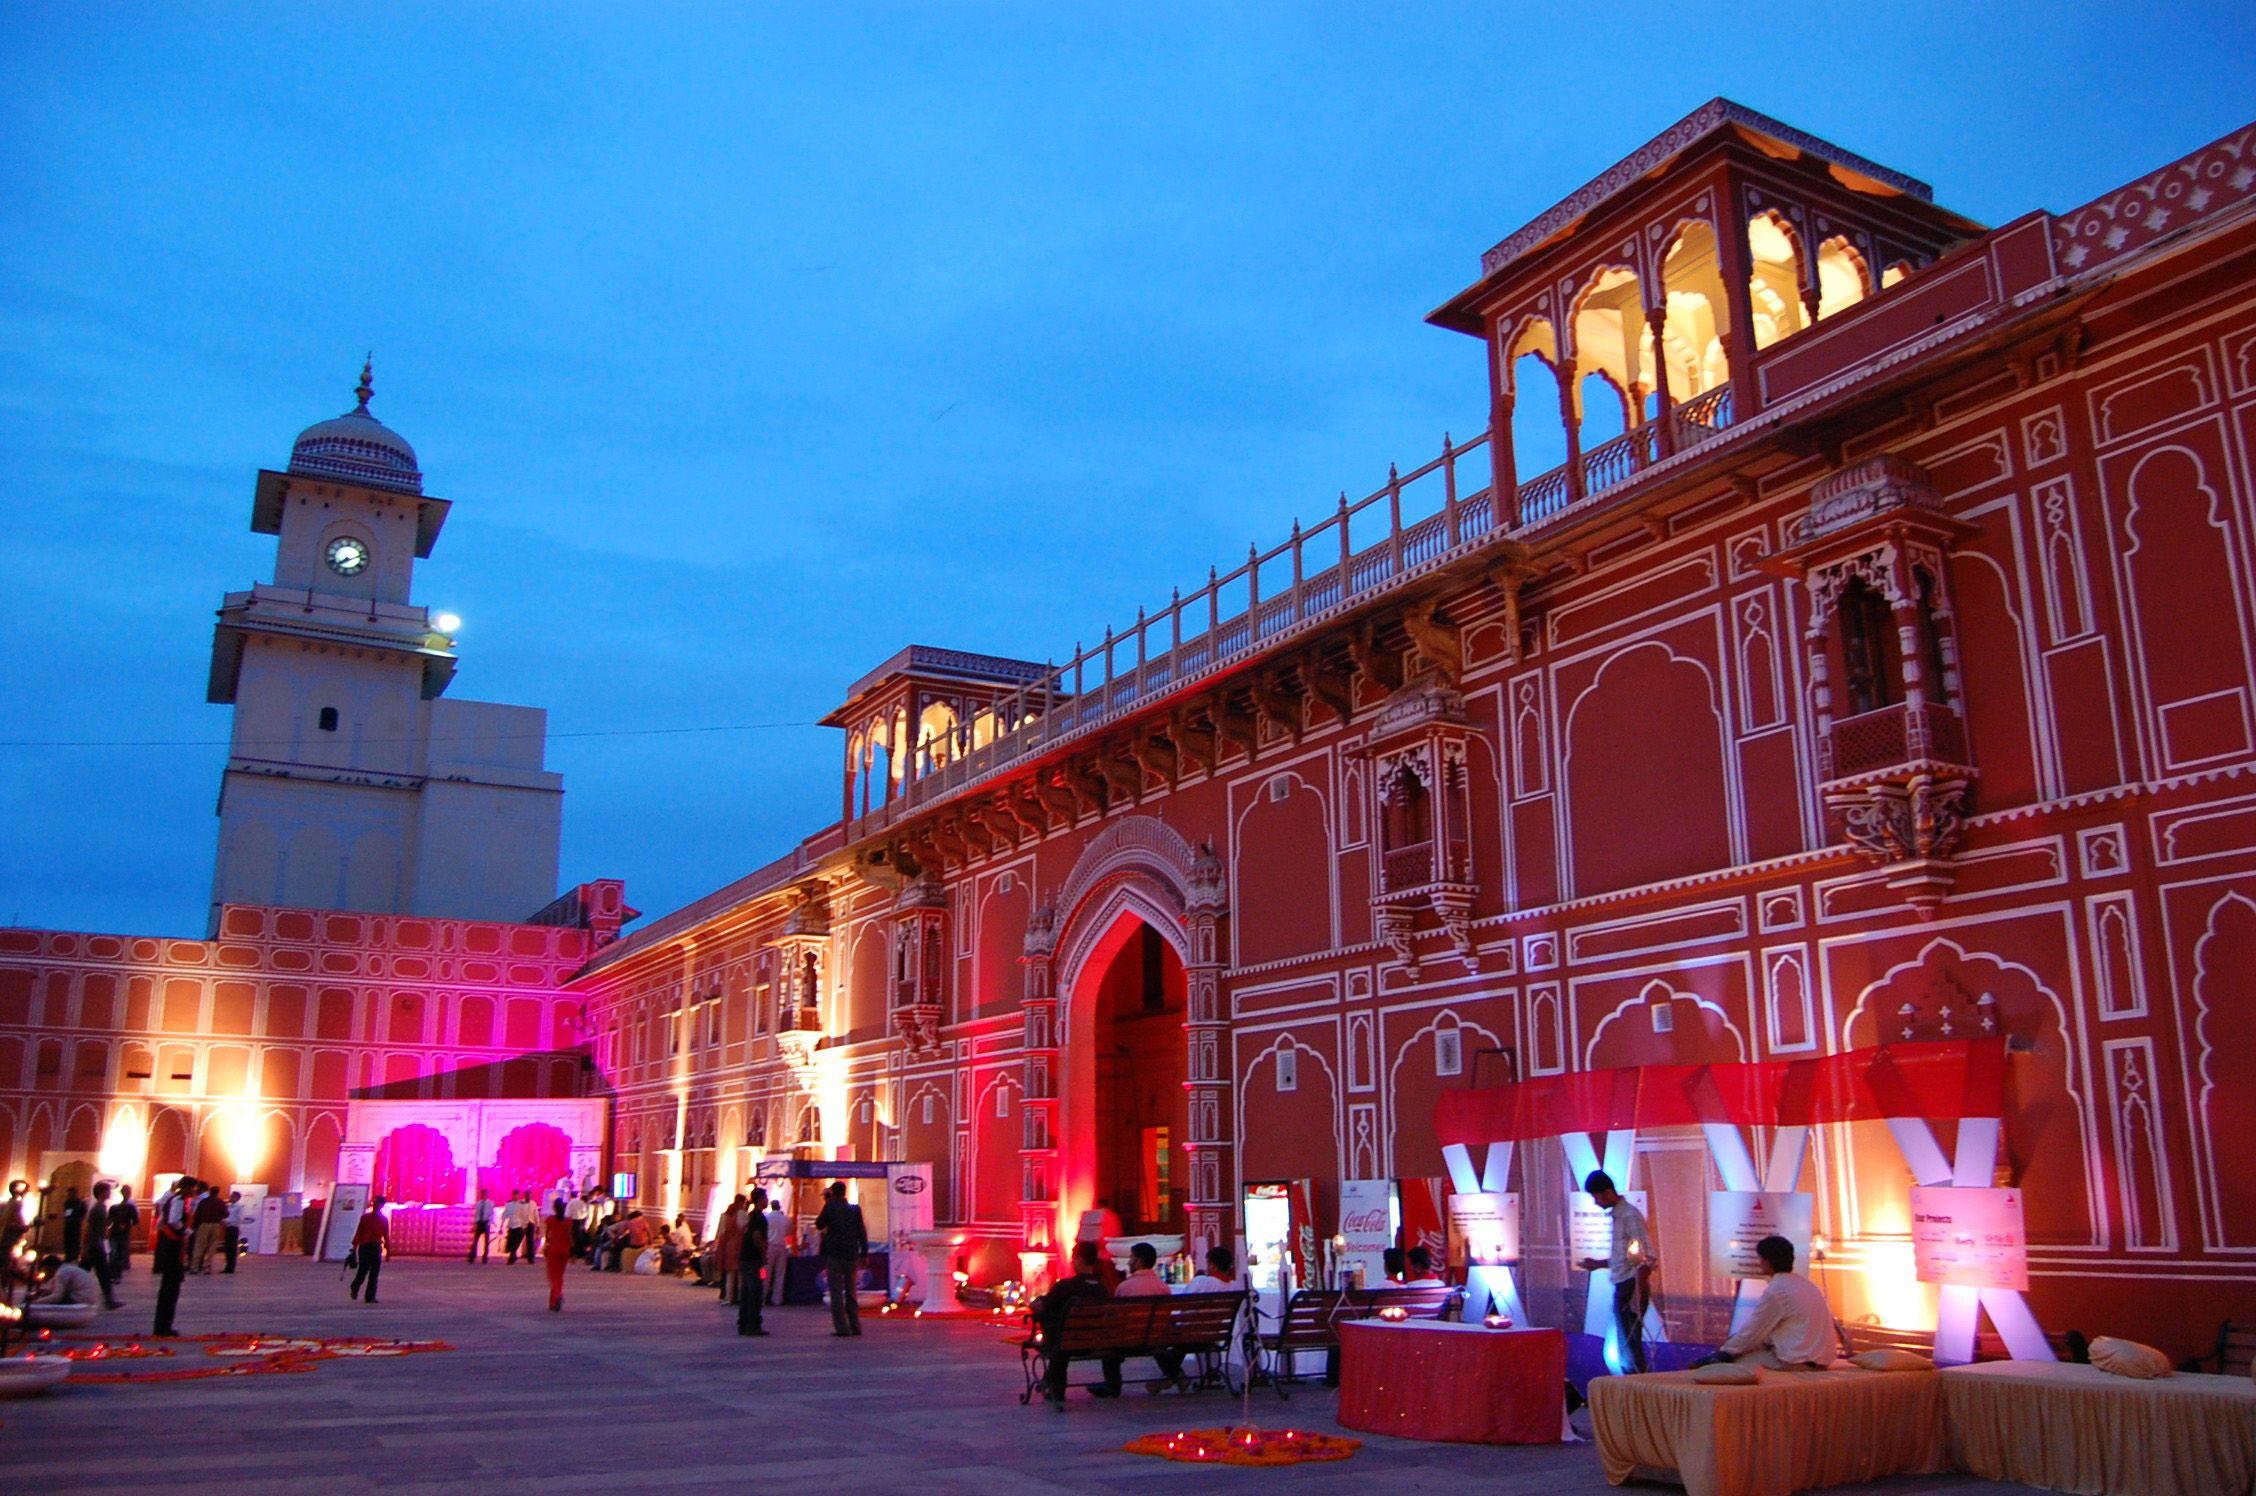 Jaipur India India Tour Cool Places To Visit City Palace Jaipur